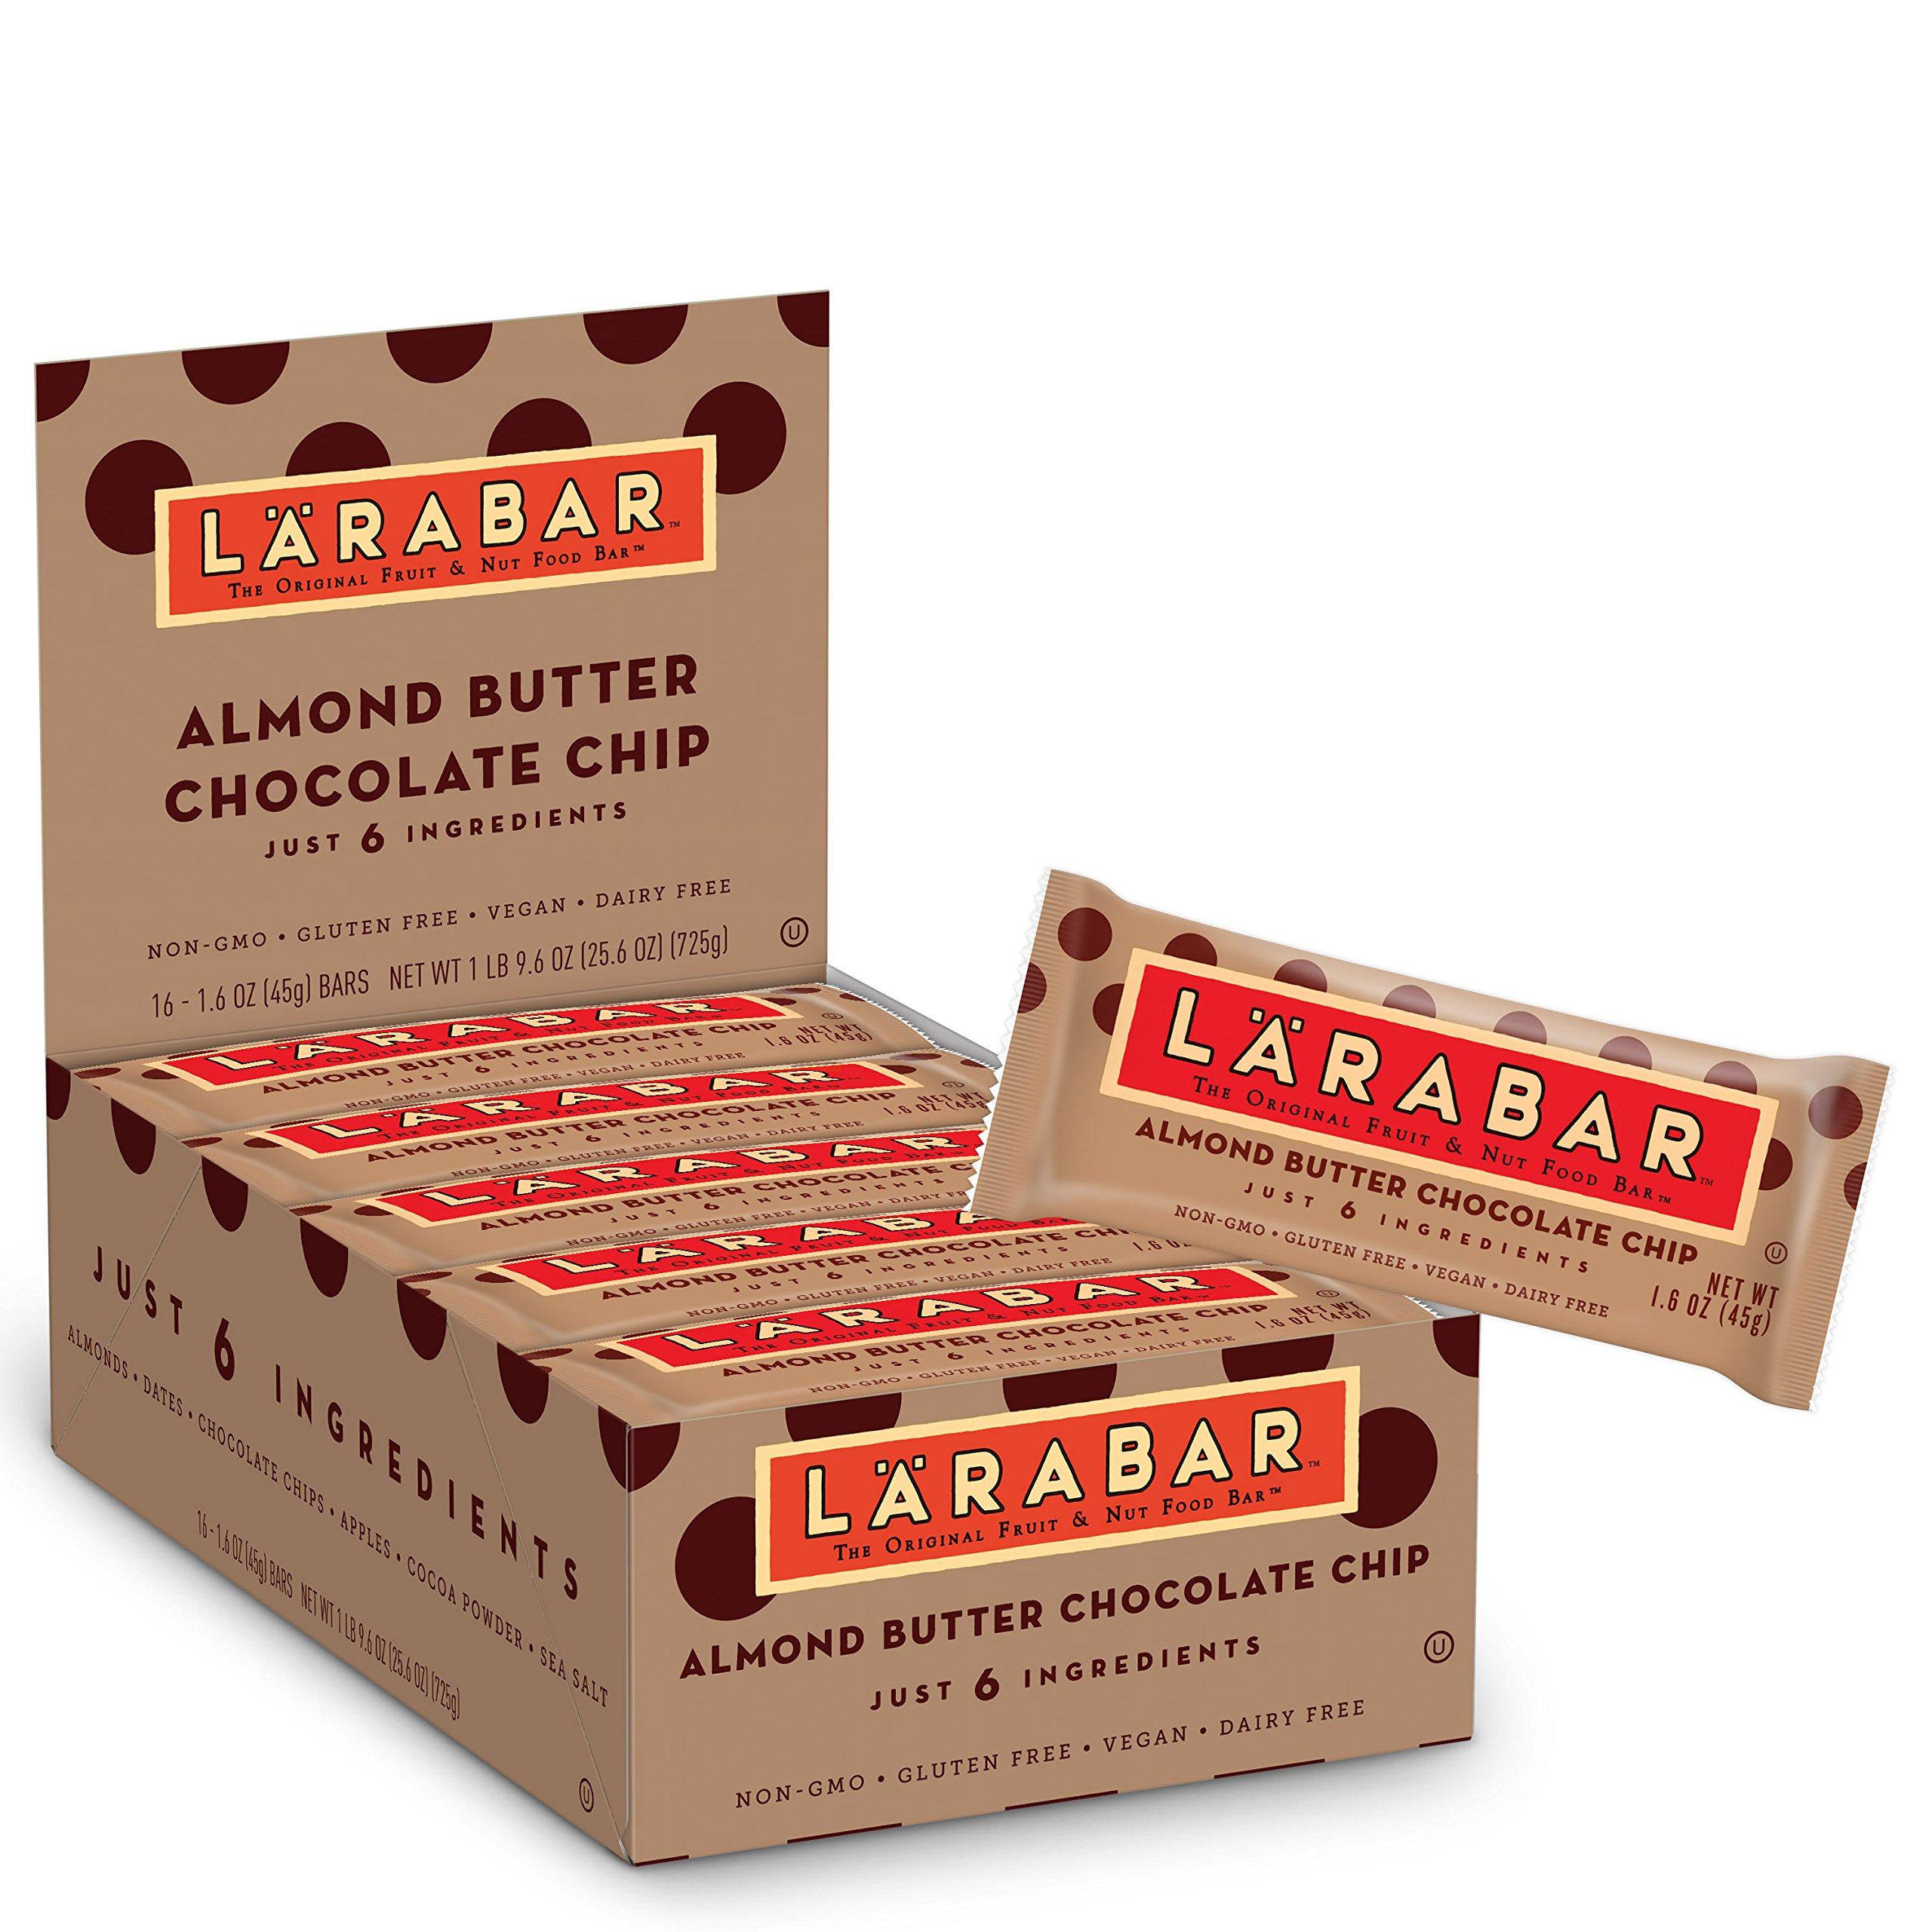 Larabar Gluten Free Bar, Almond Butter Chocolate Chip, 1.6 oz Bars (16 Count), Whole Food Gluten Free Bars, Dairy Free Snacks